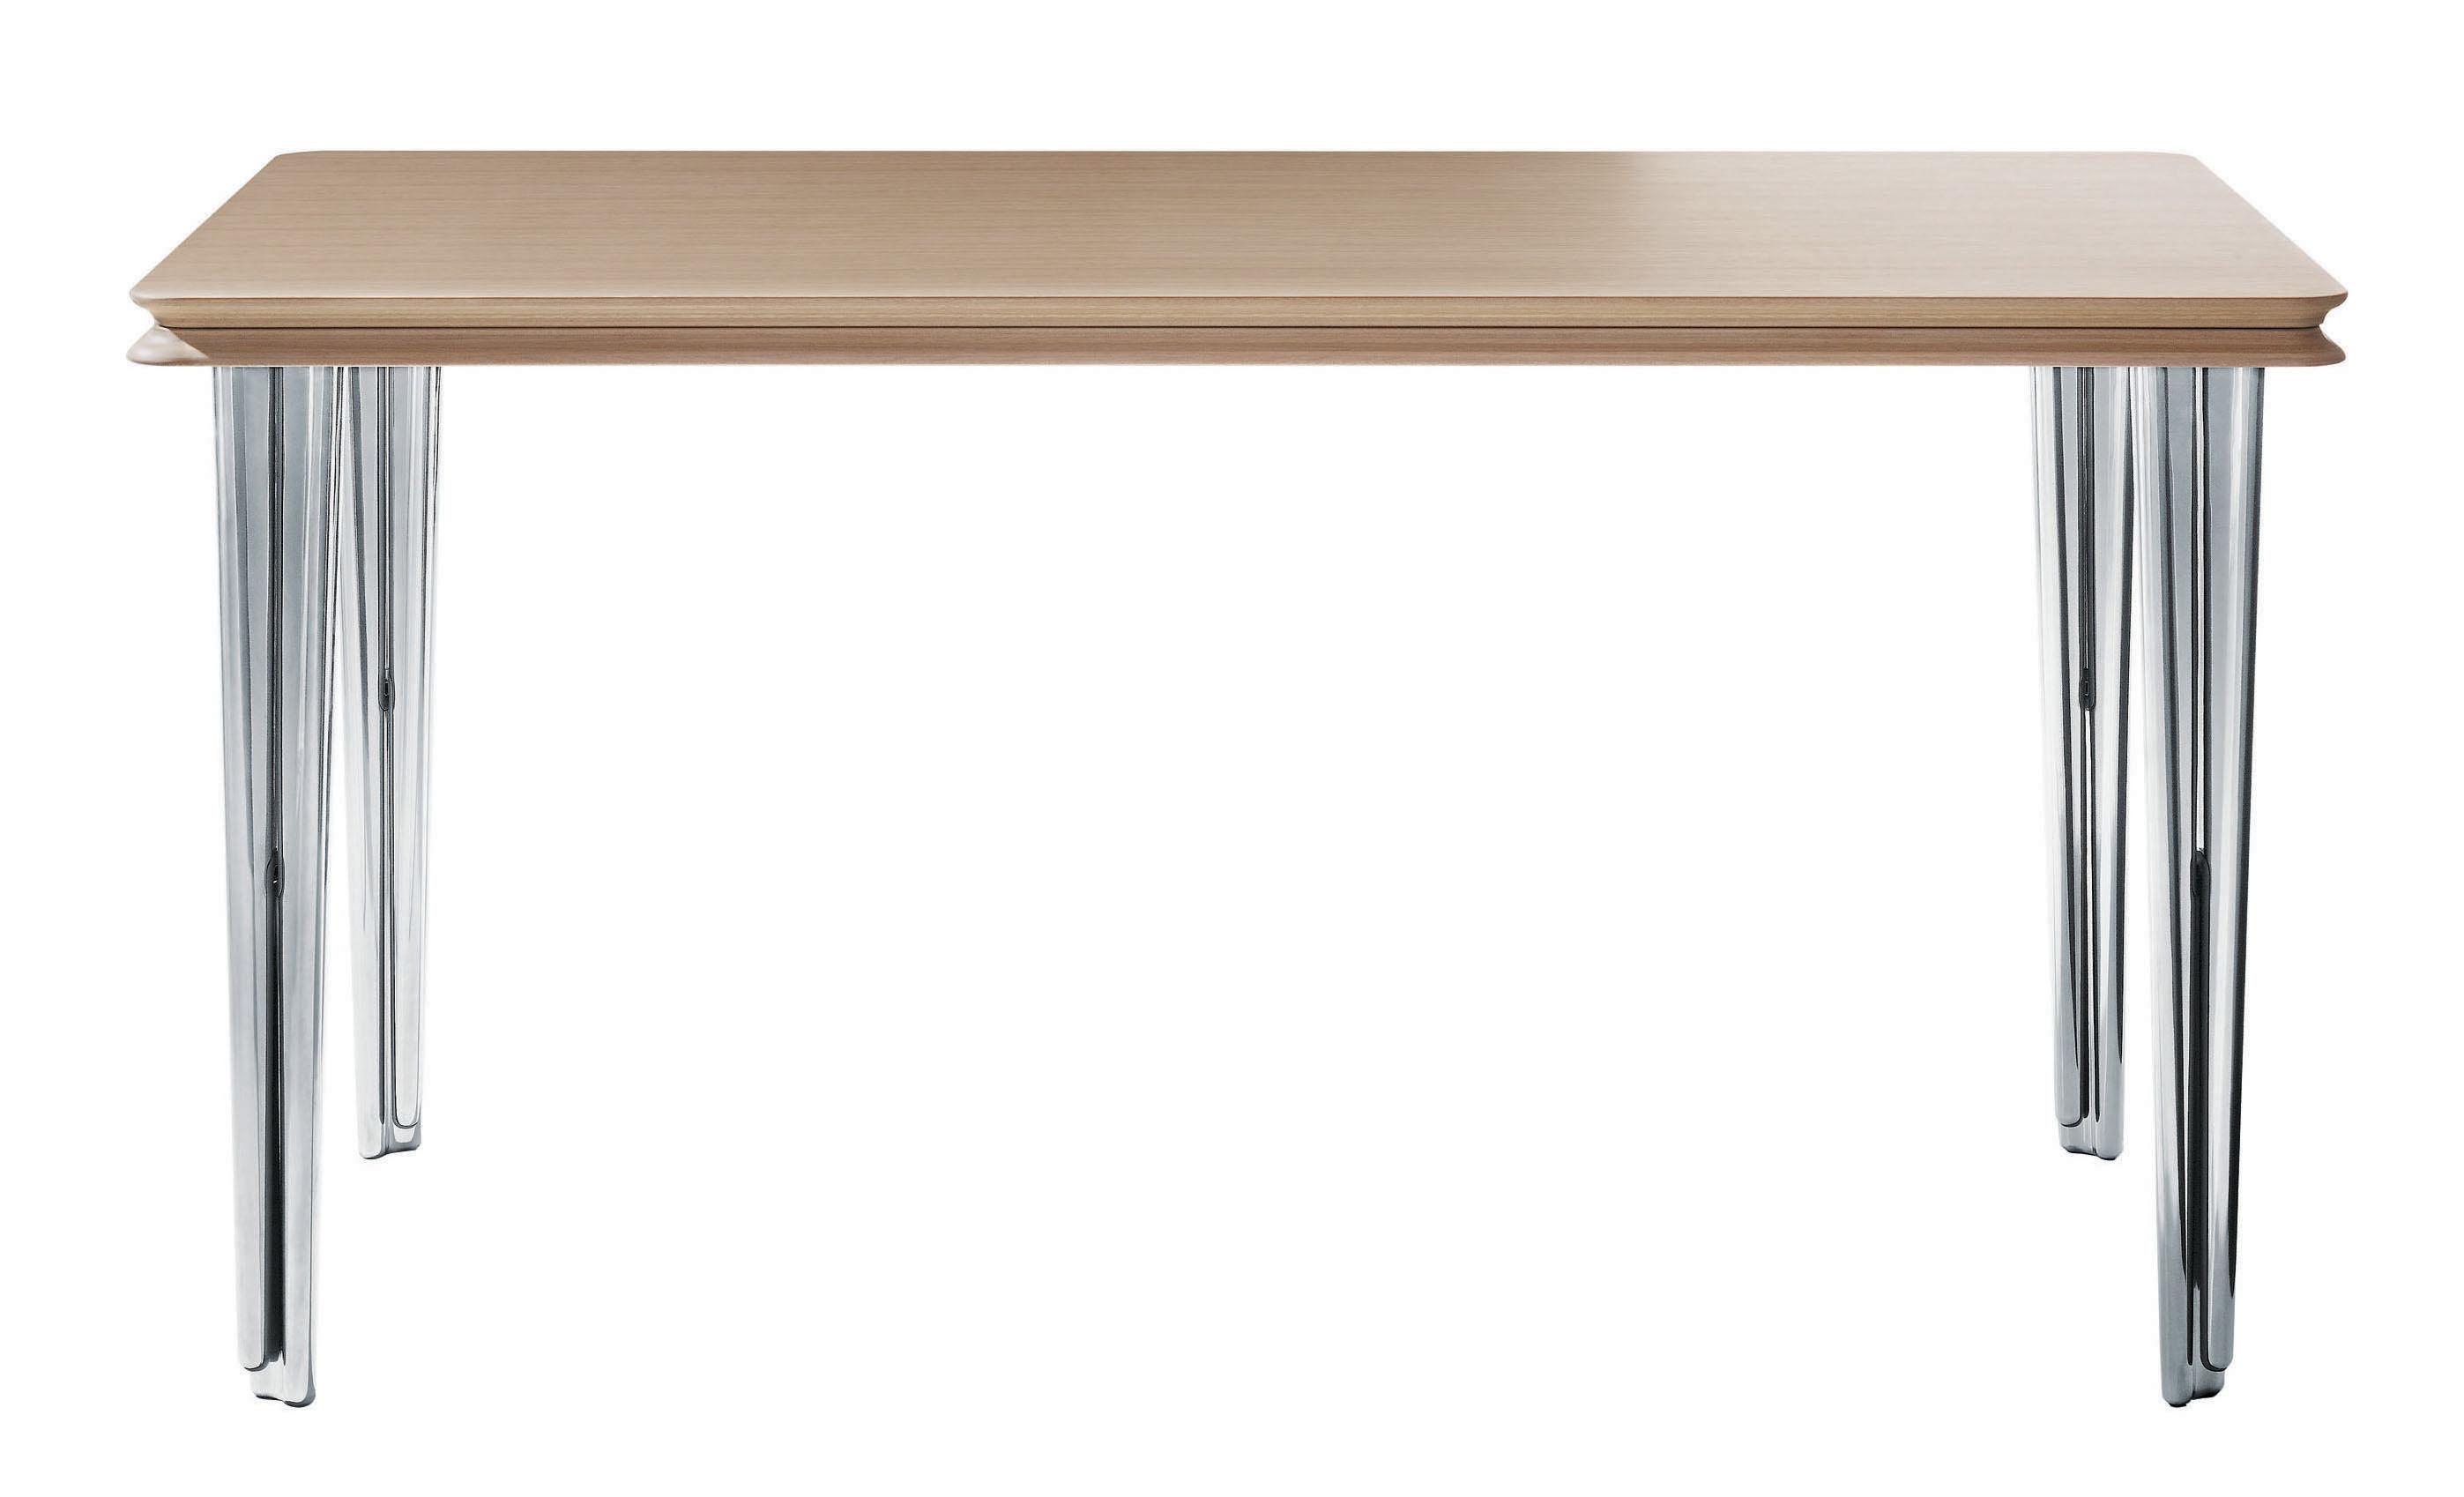 Furniture - Teen furniture - Piggyback Extending table - Set of 2 stackable tables by Magis - oak top / alu legs - Oak, Polished cast aluminium